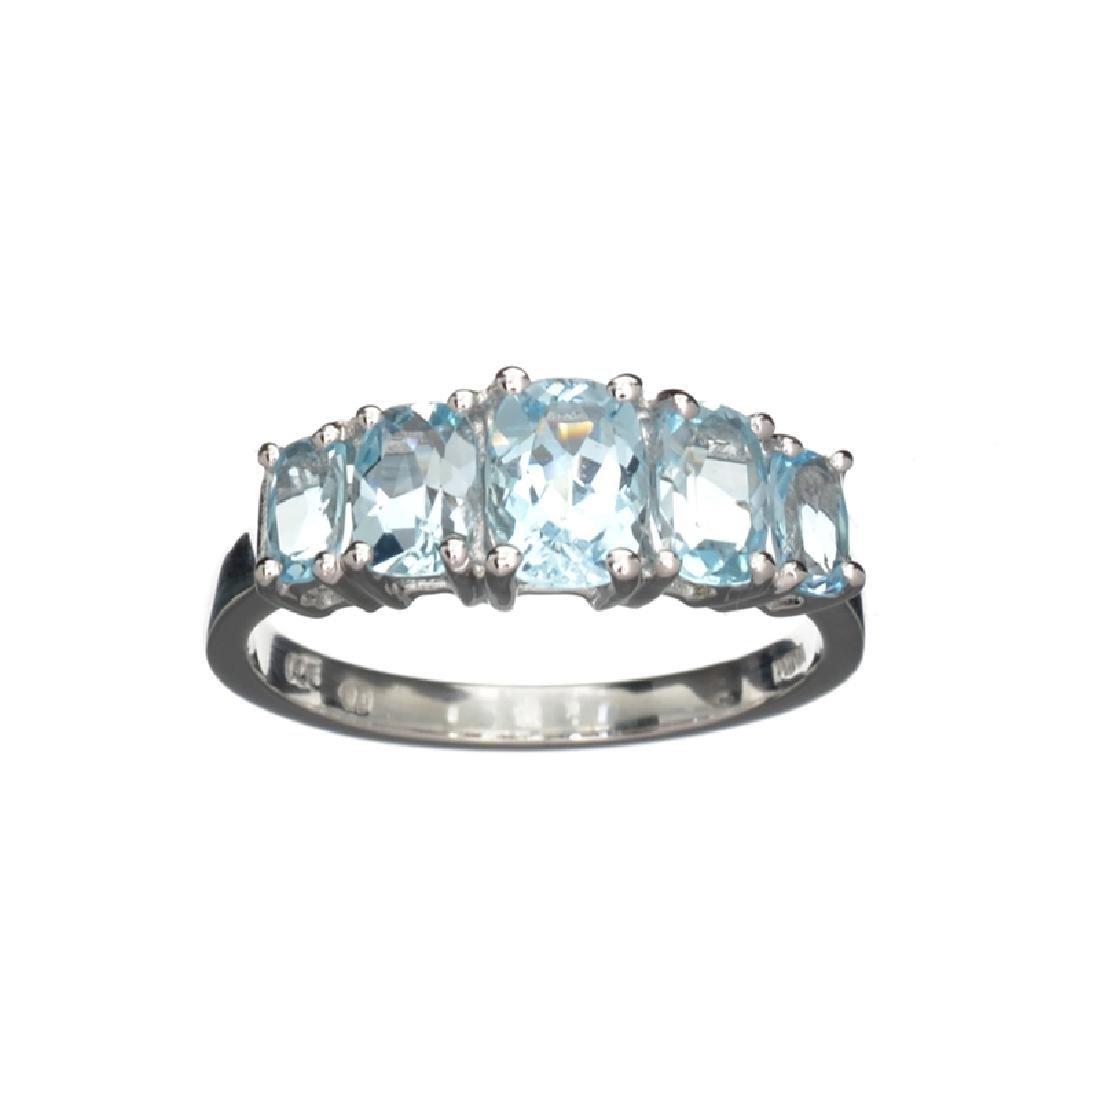 APP: 0.3k Fine Jewelry 3.00CT Cushion Cut Blue Topaz